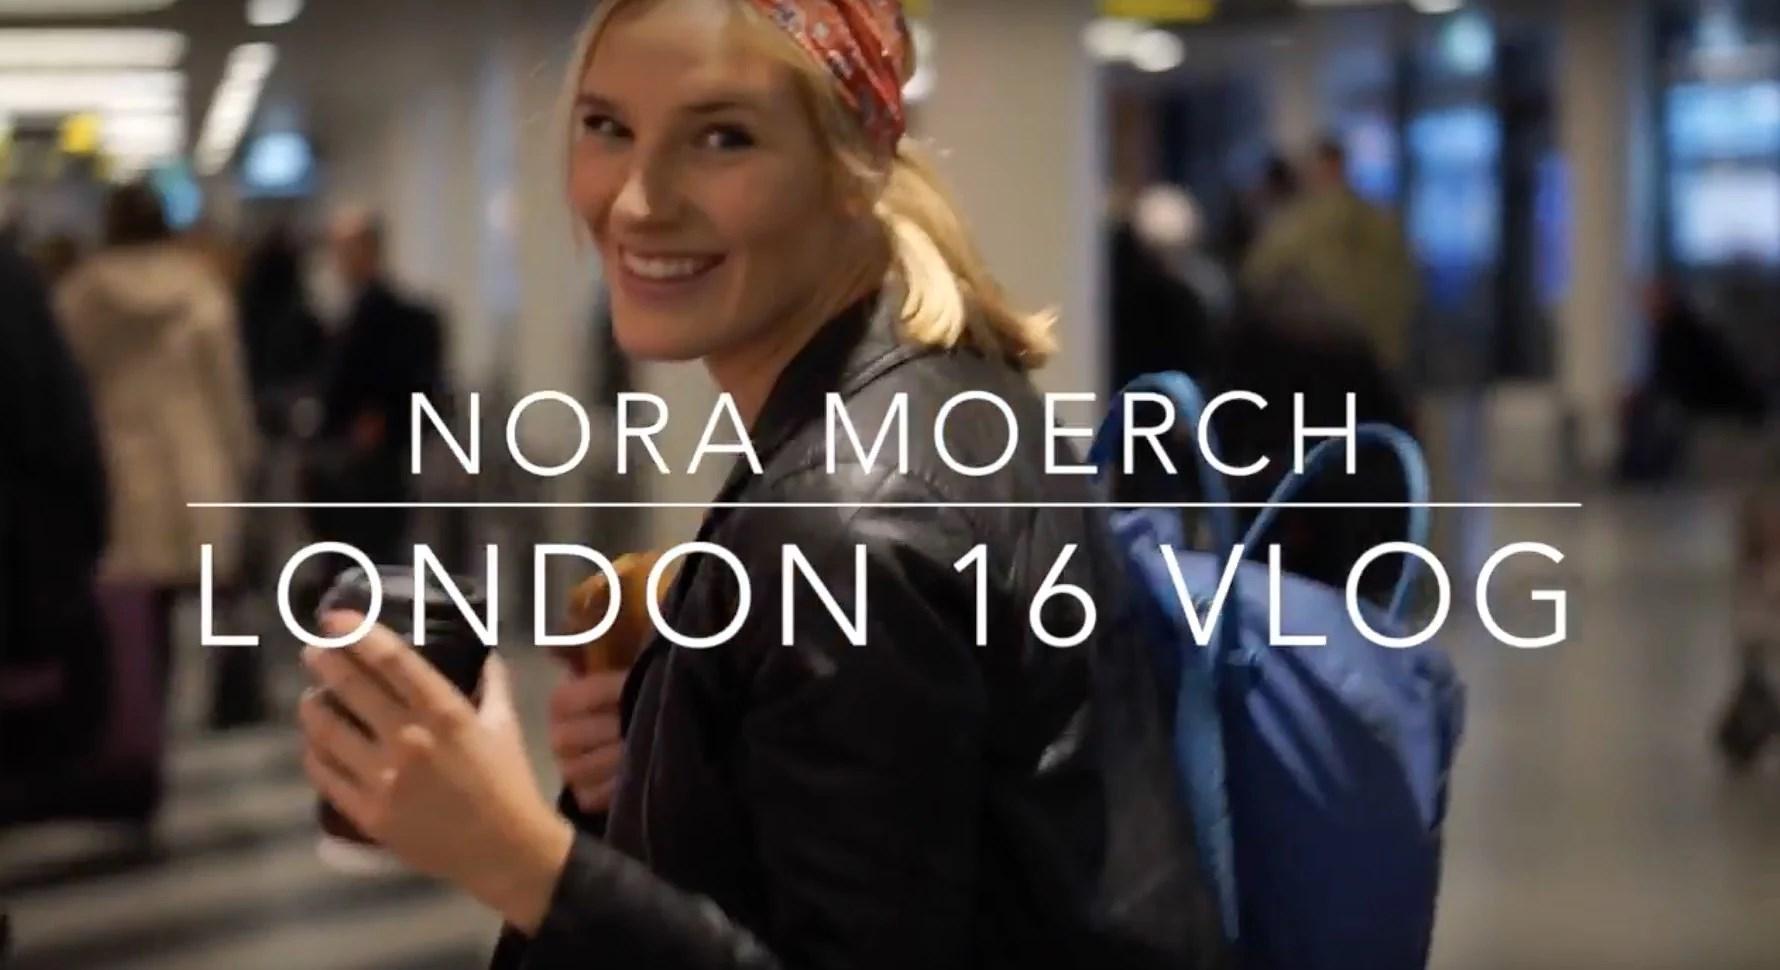 London 16 Vlog